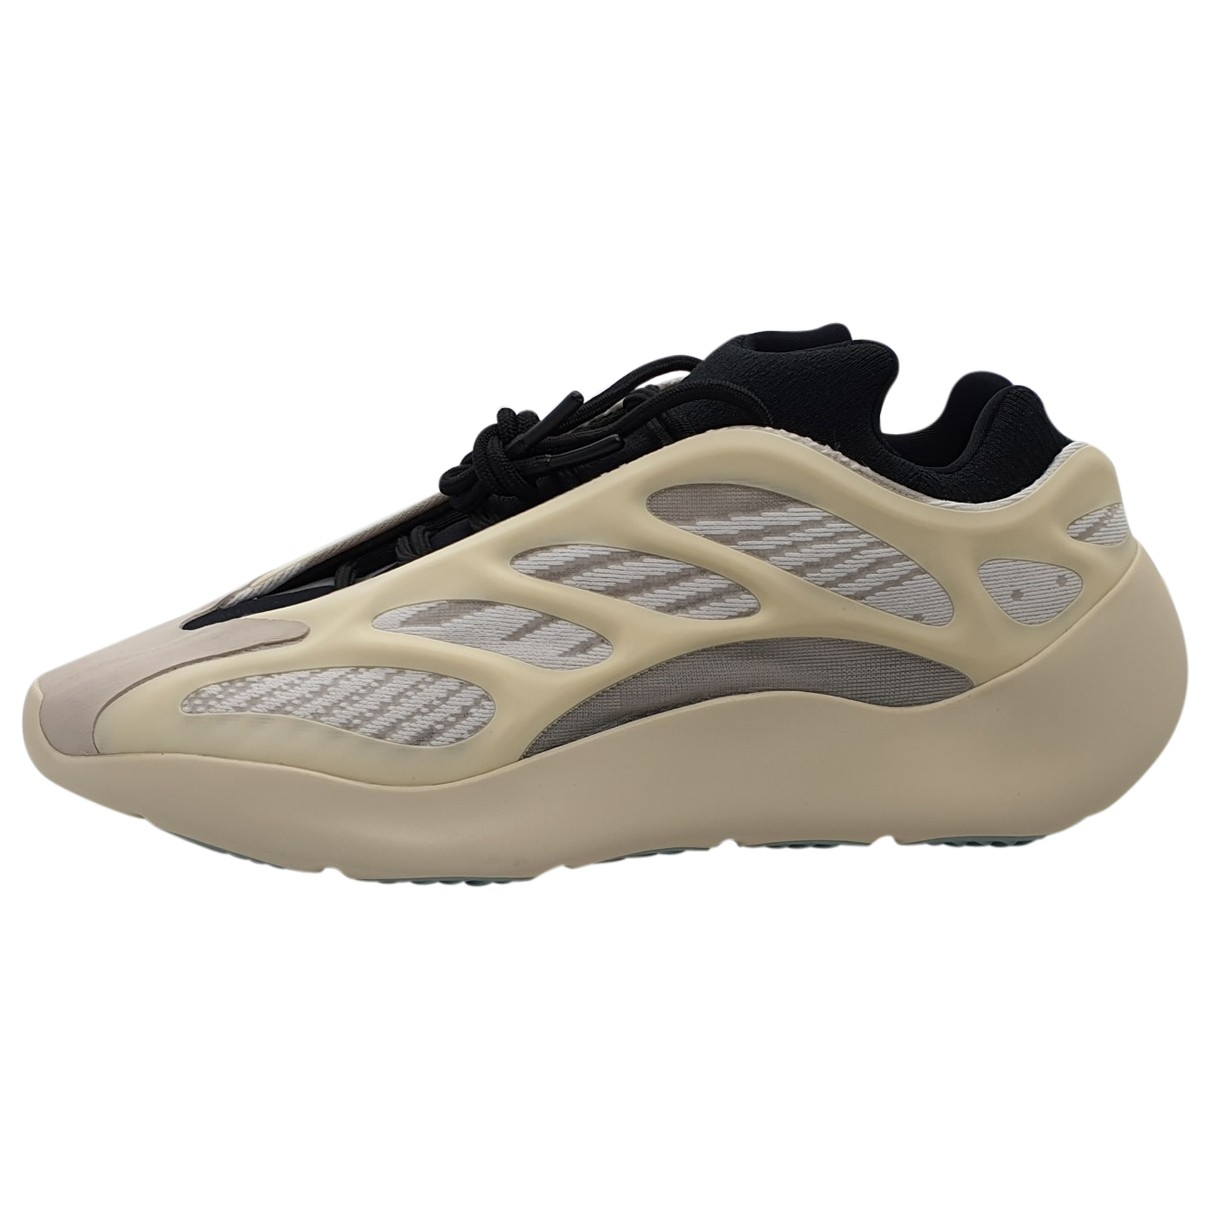 Deportivas Boost 700 V3 Yeezy X Adidas